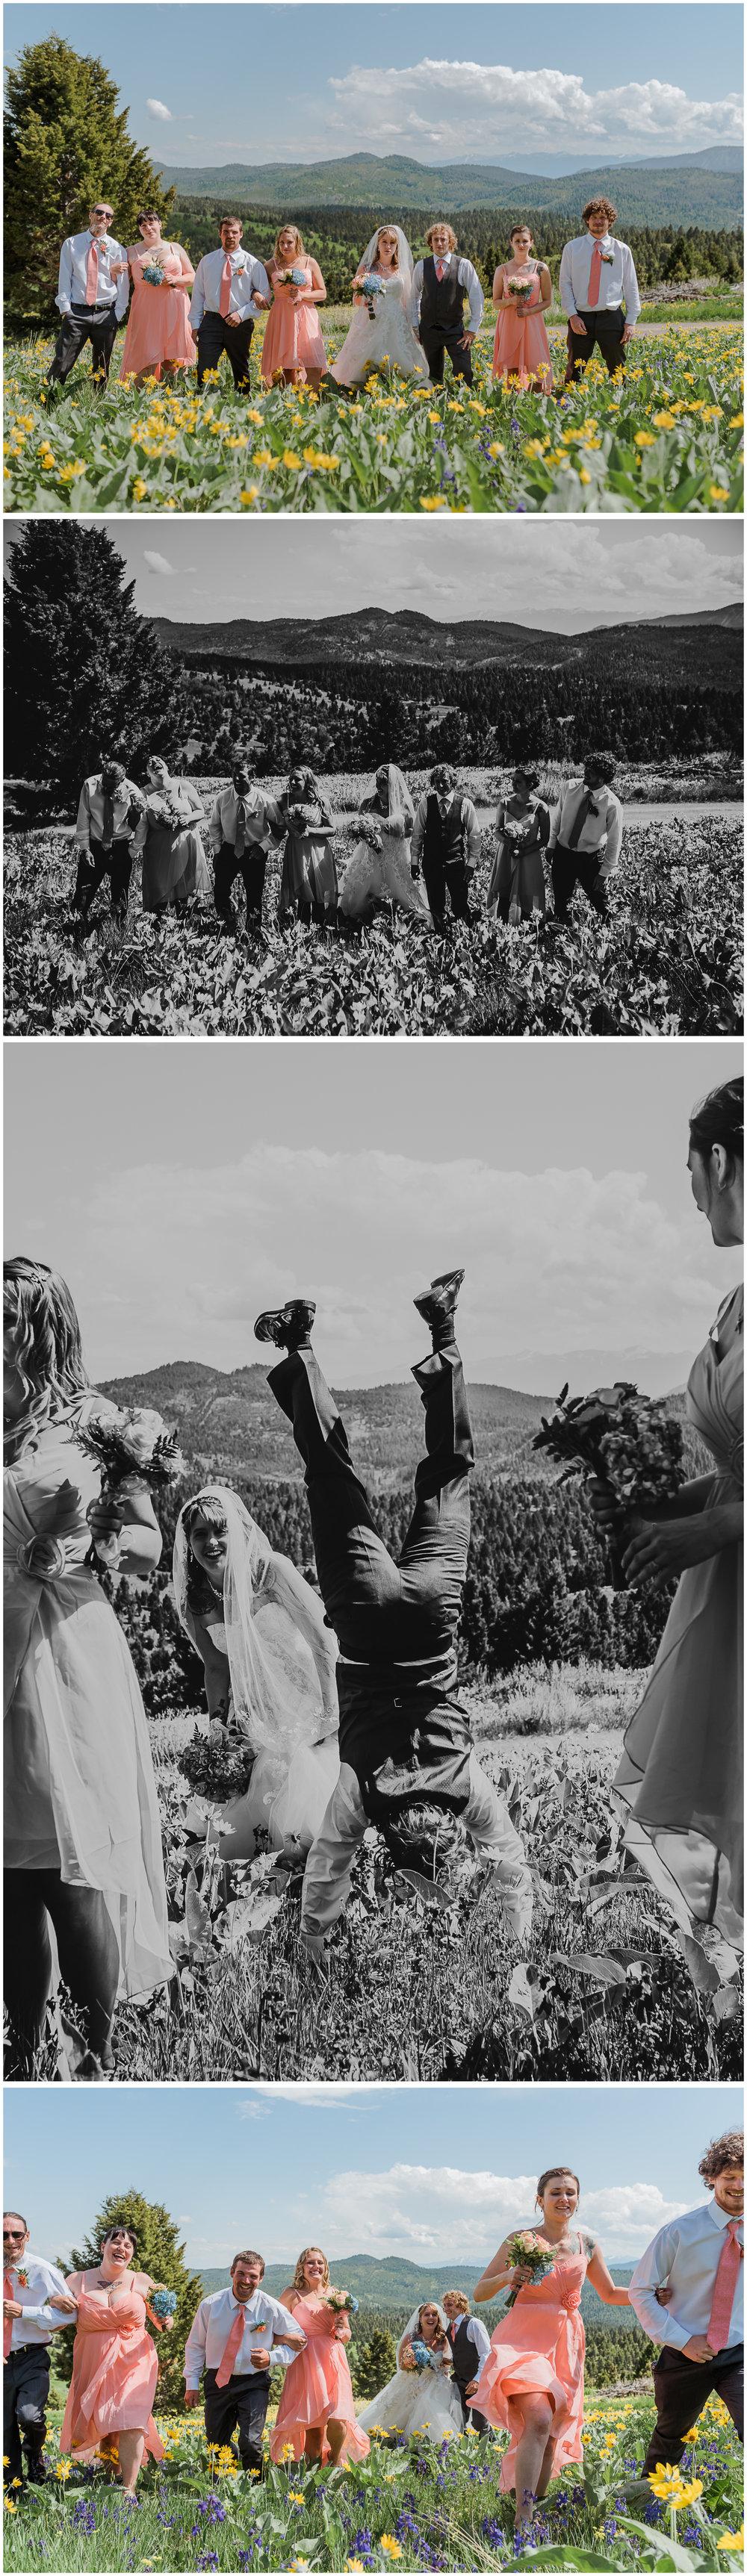 Montana Mountain Wedding. Sagebrush Studio Photography. Shelby, Montana. North Central Montana Photographer.